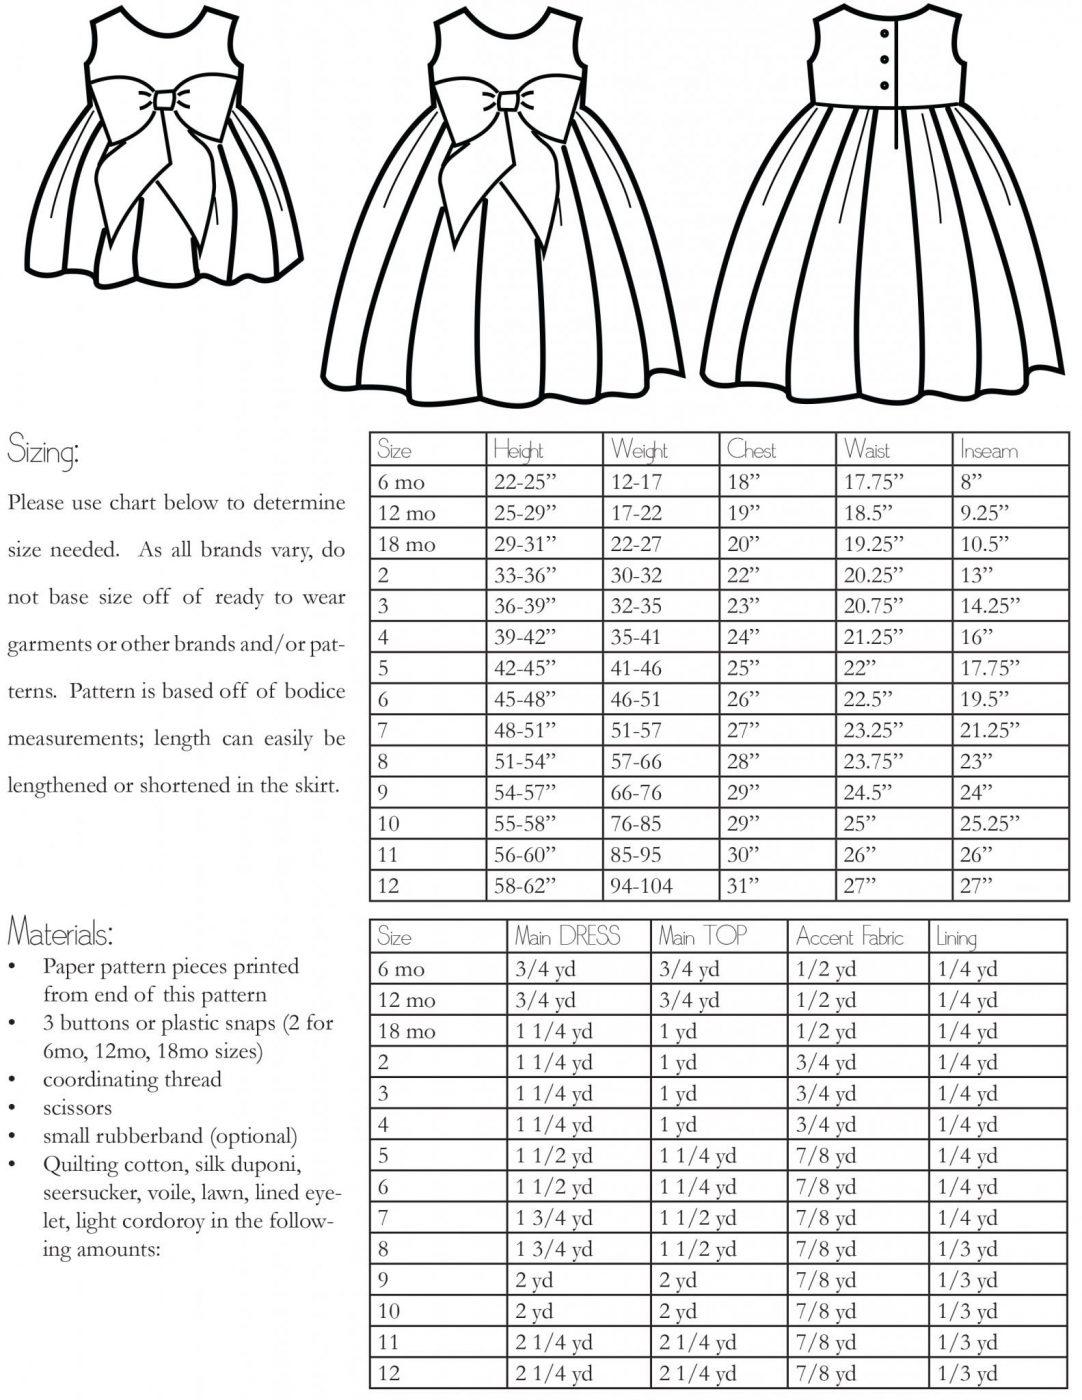 The Wundershon Information